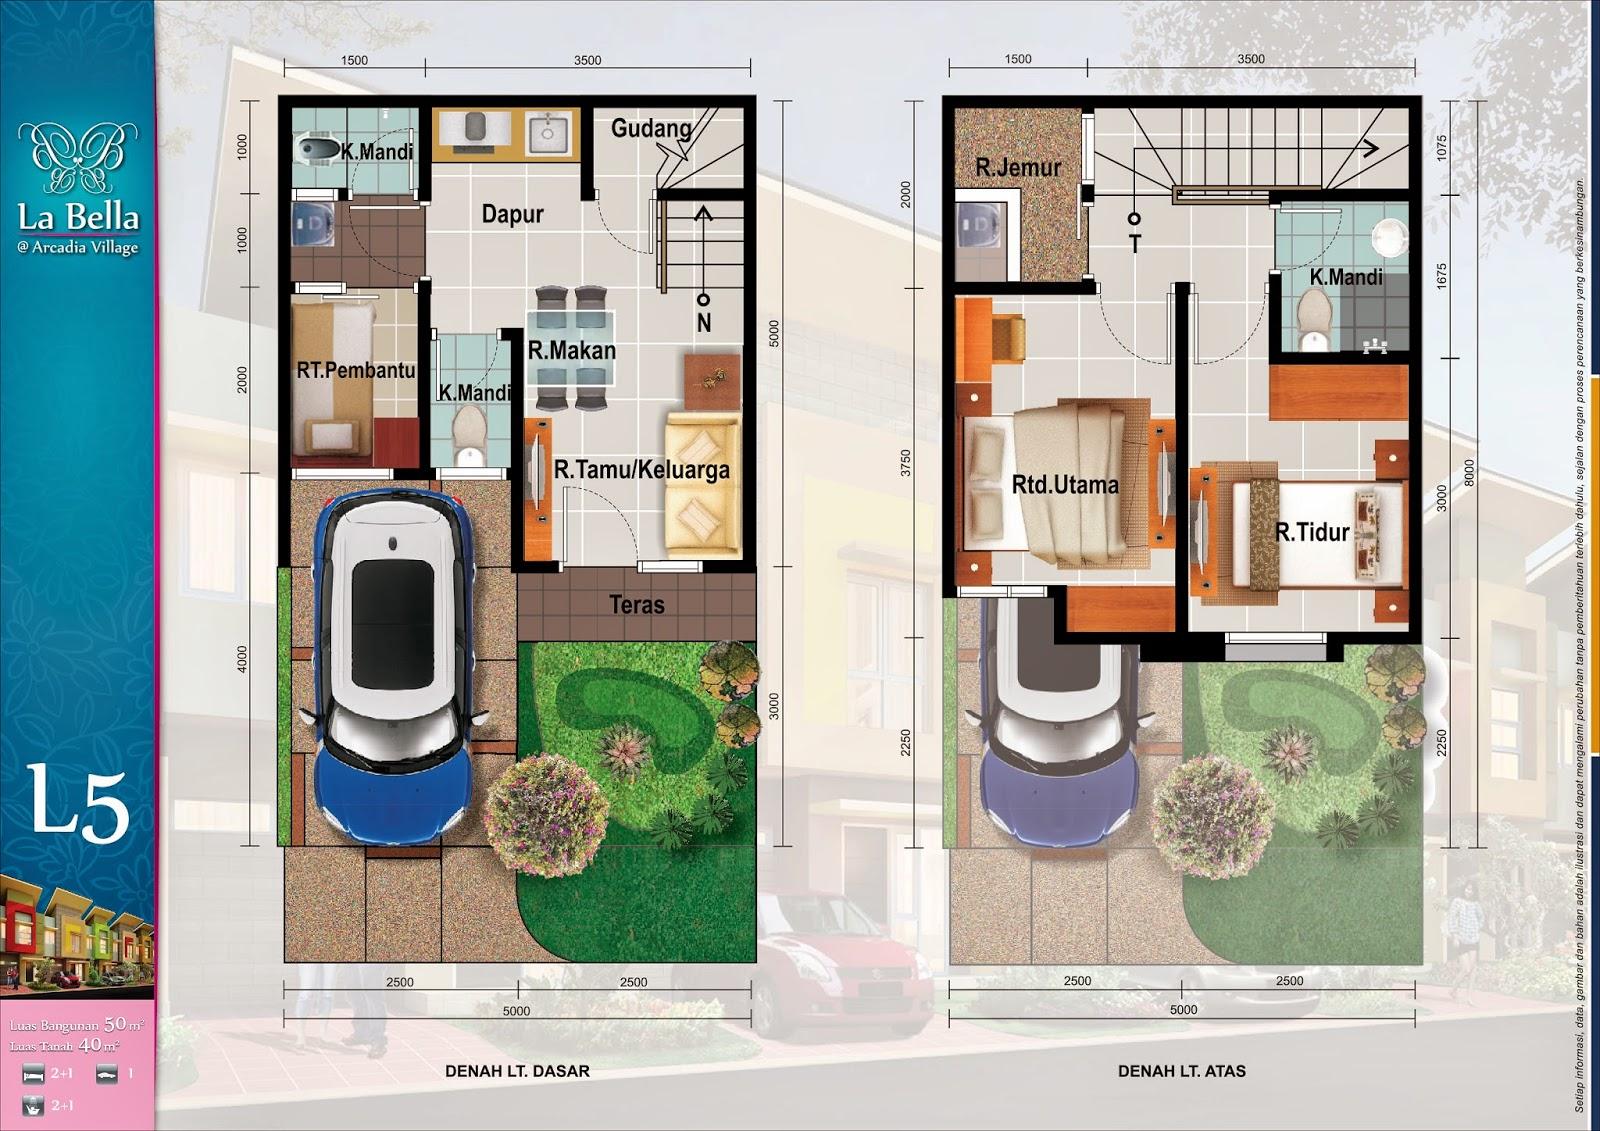 Denah Dijual Rumah Baru Paramount Gading Serpong La Bella Arcadia Village